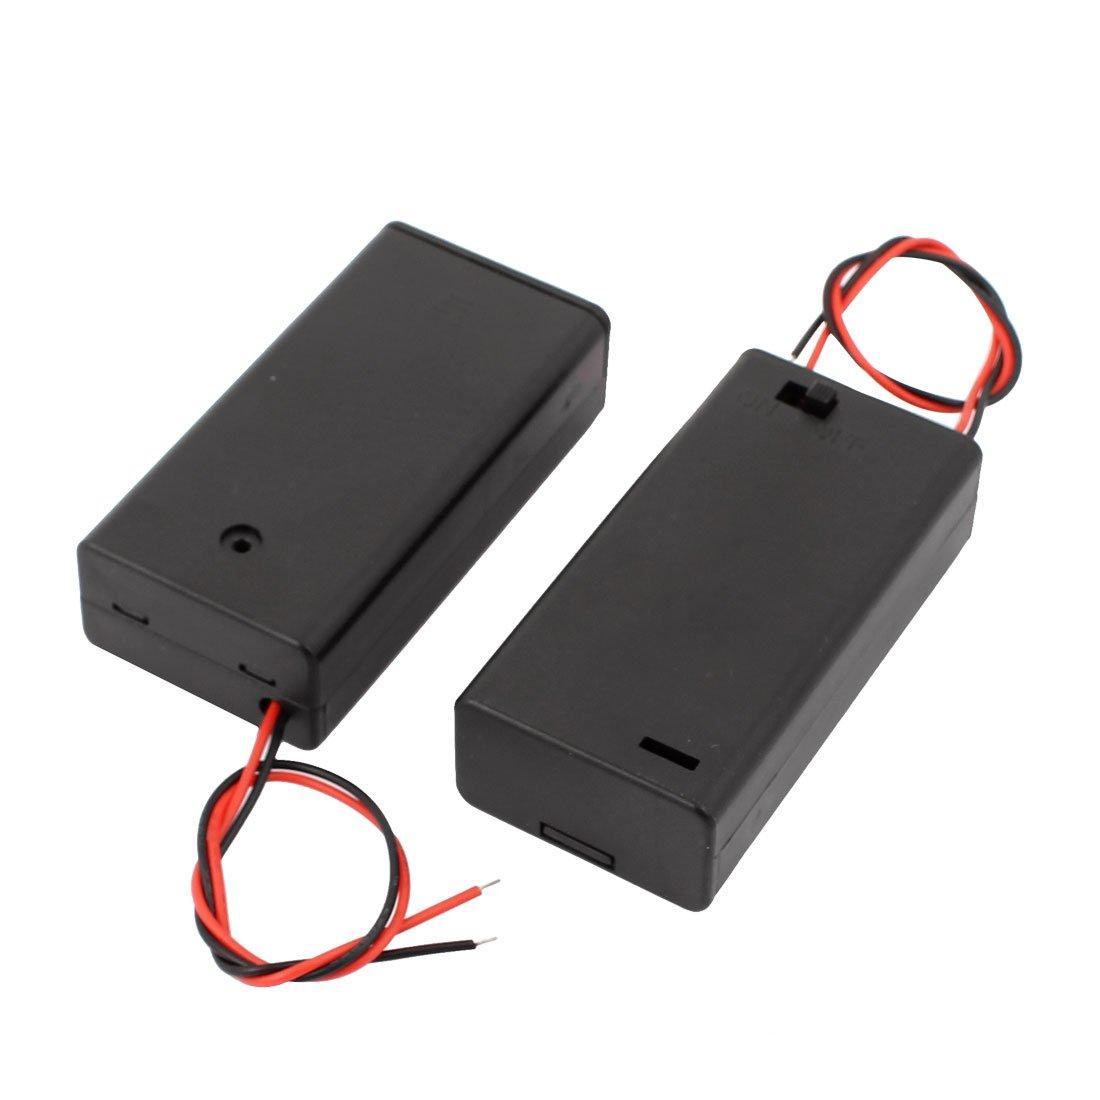 Map 2 Unidades Interruptor on/Off 2 Hilos de baterías Caja con Tapa para 2 X Pilas AA 1,5 V: Amazon.es: Electrónica